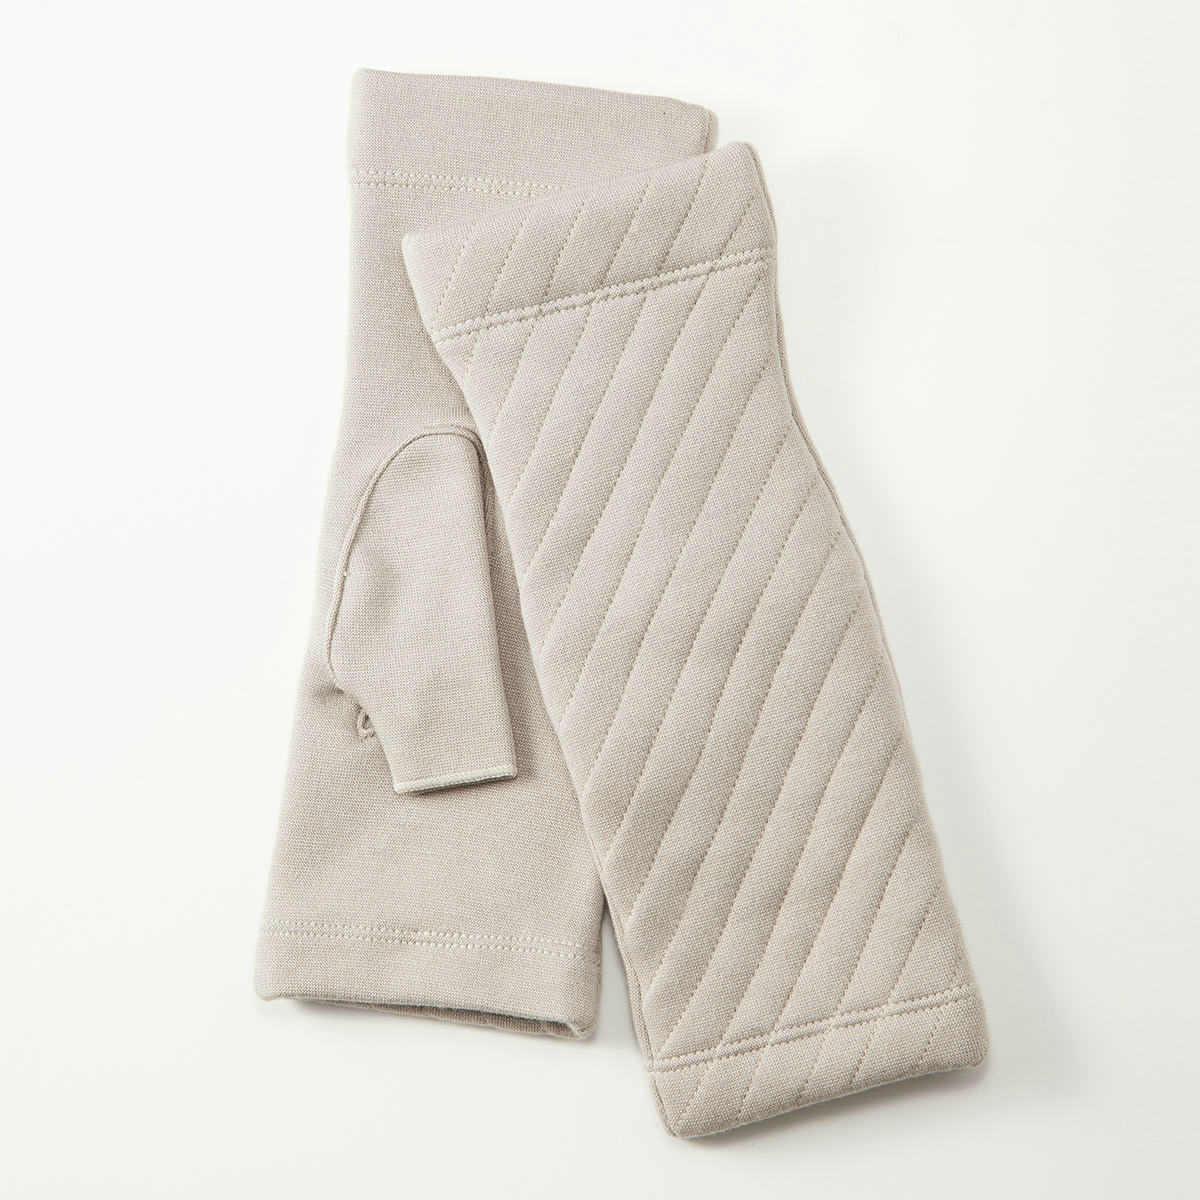 BIYUTE レディース ジャージ手袋 指なしタイプ キルティングデザイン ストレッチ素材 Mサイズ 全3色